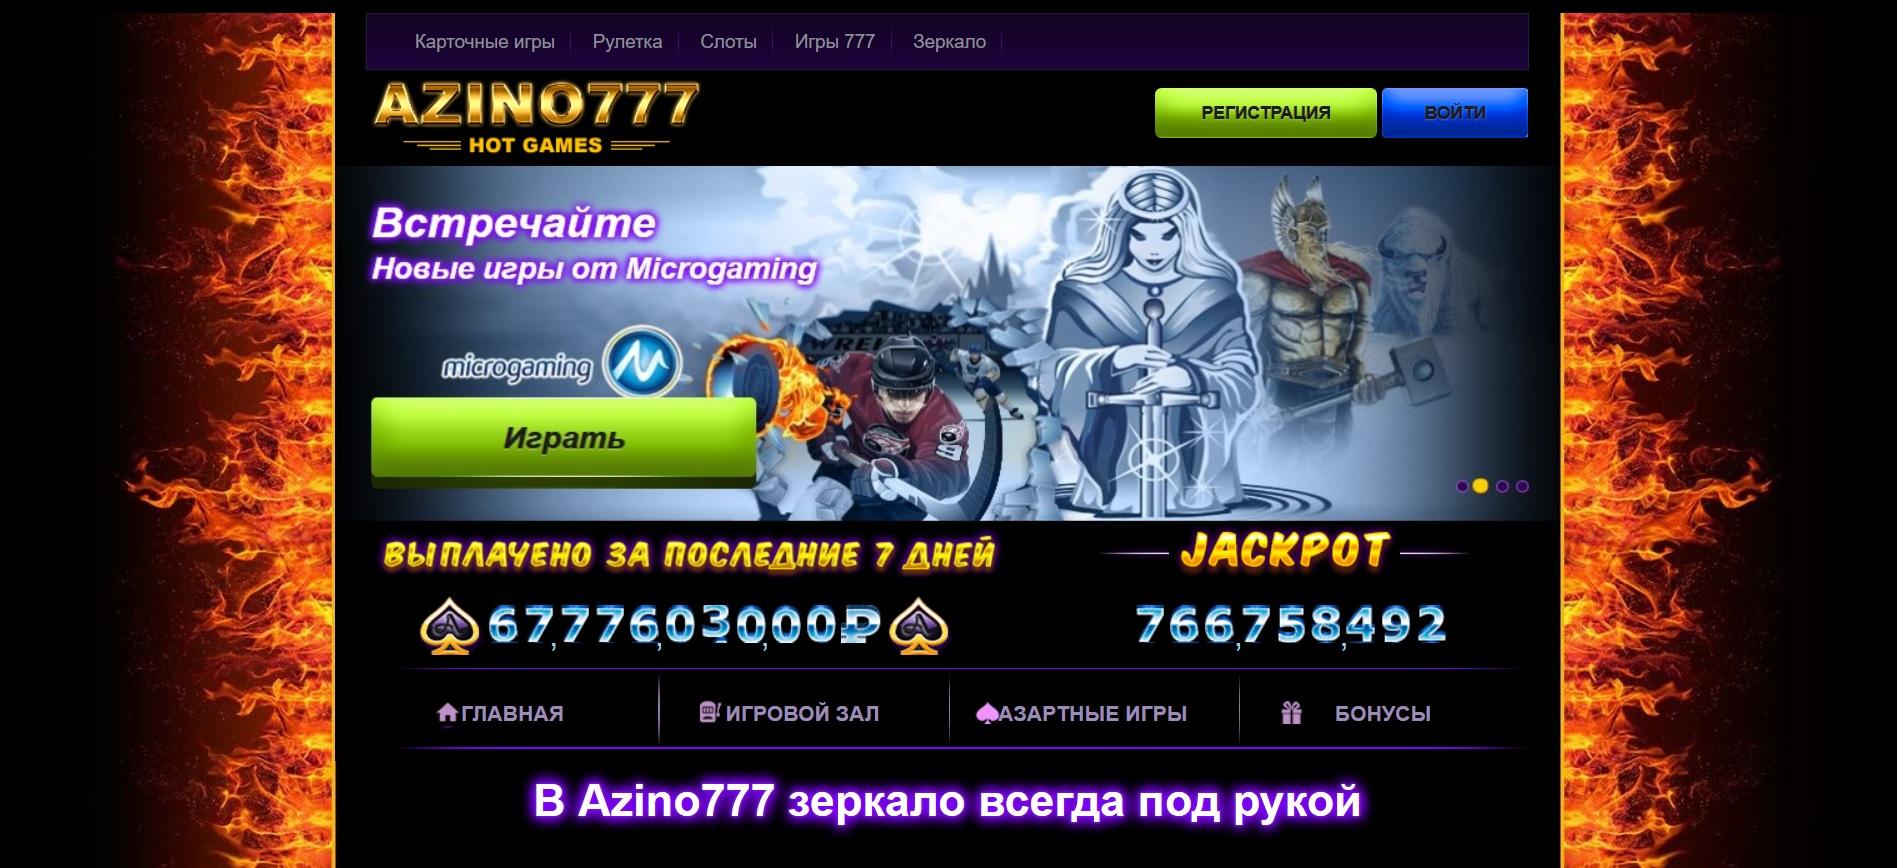 телефон поддержки азино777